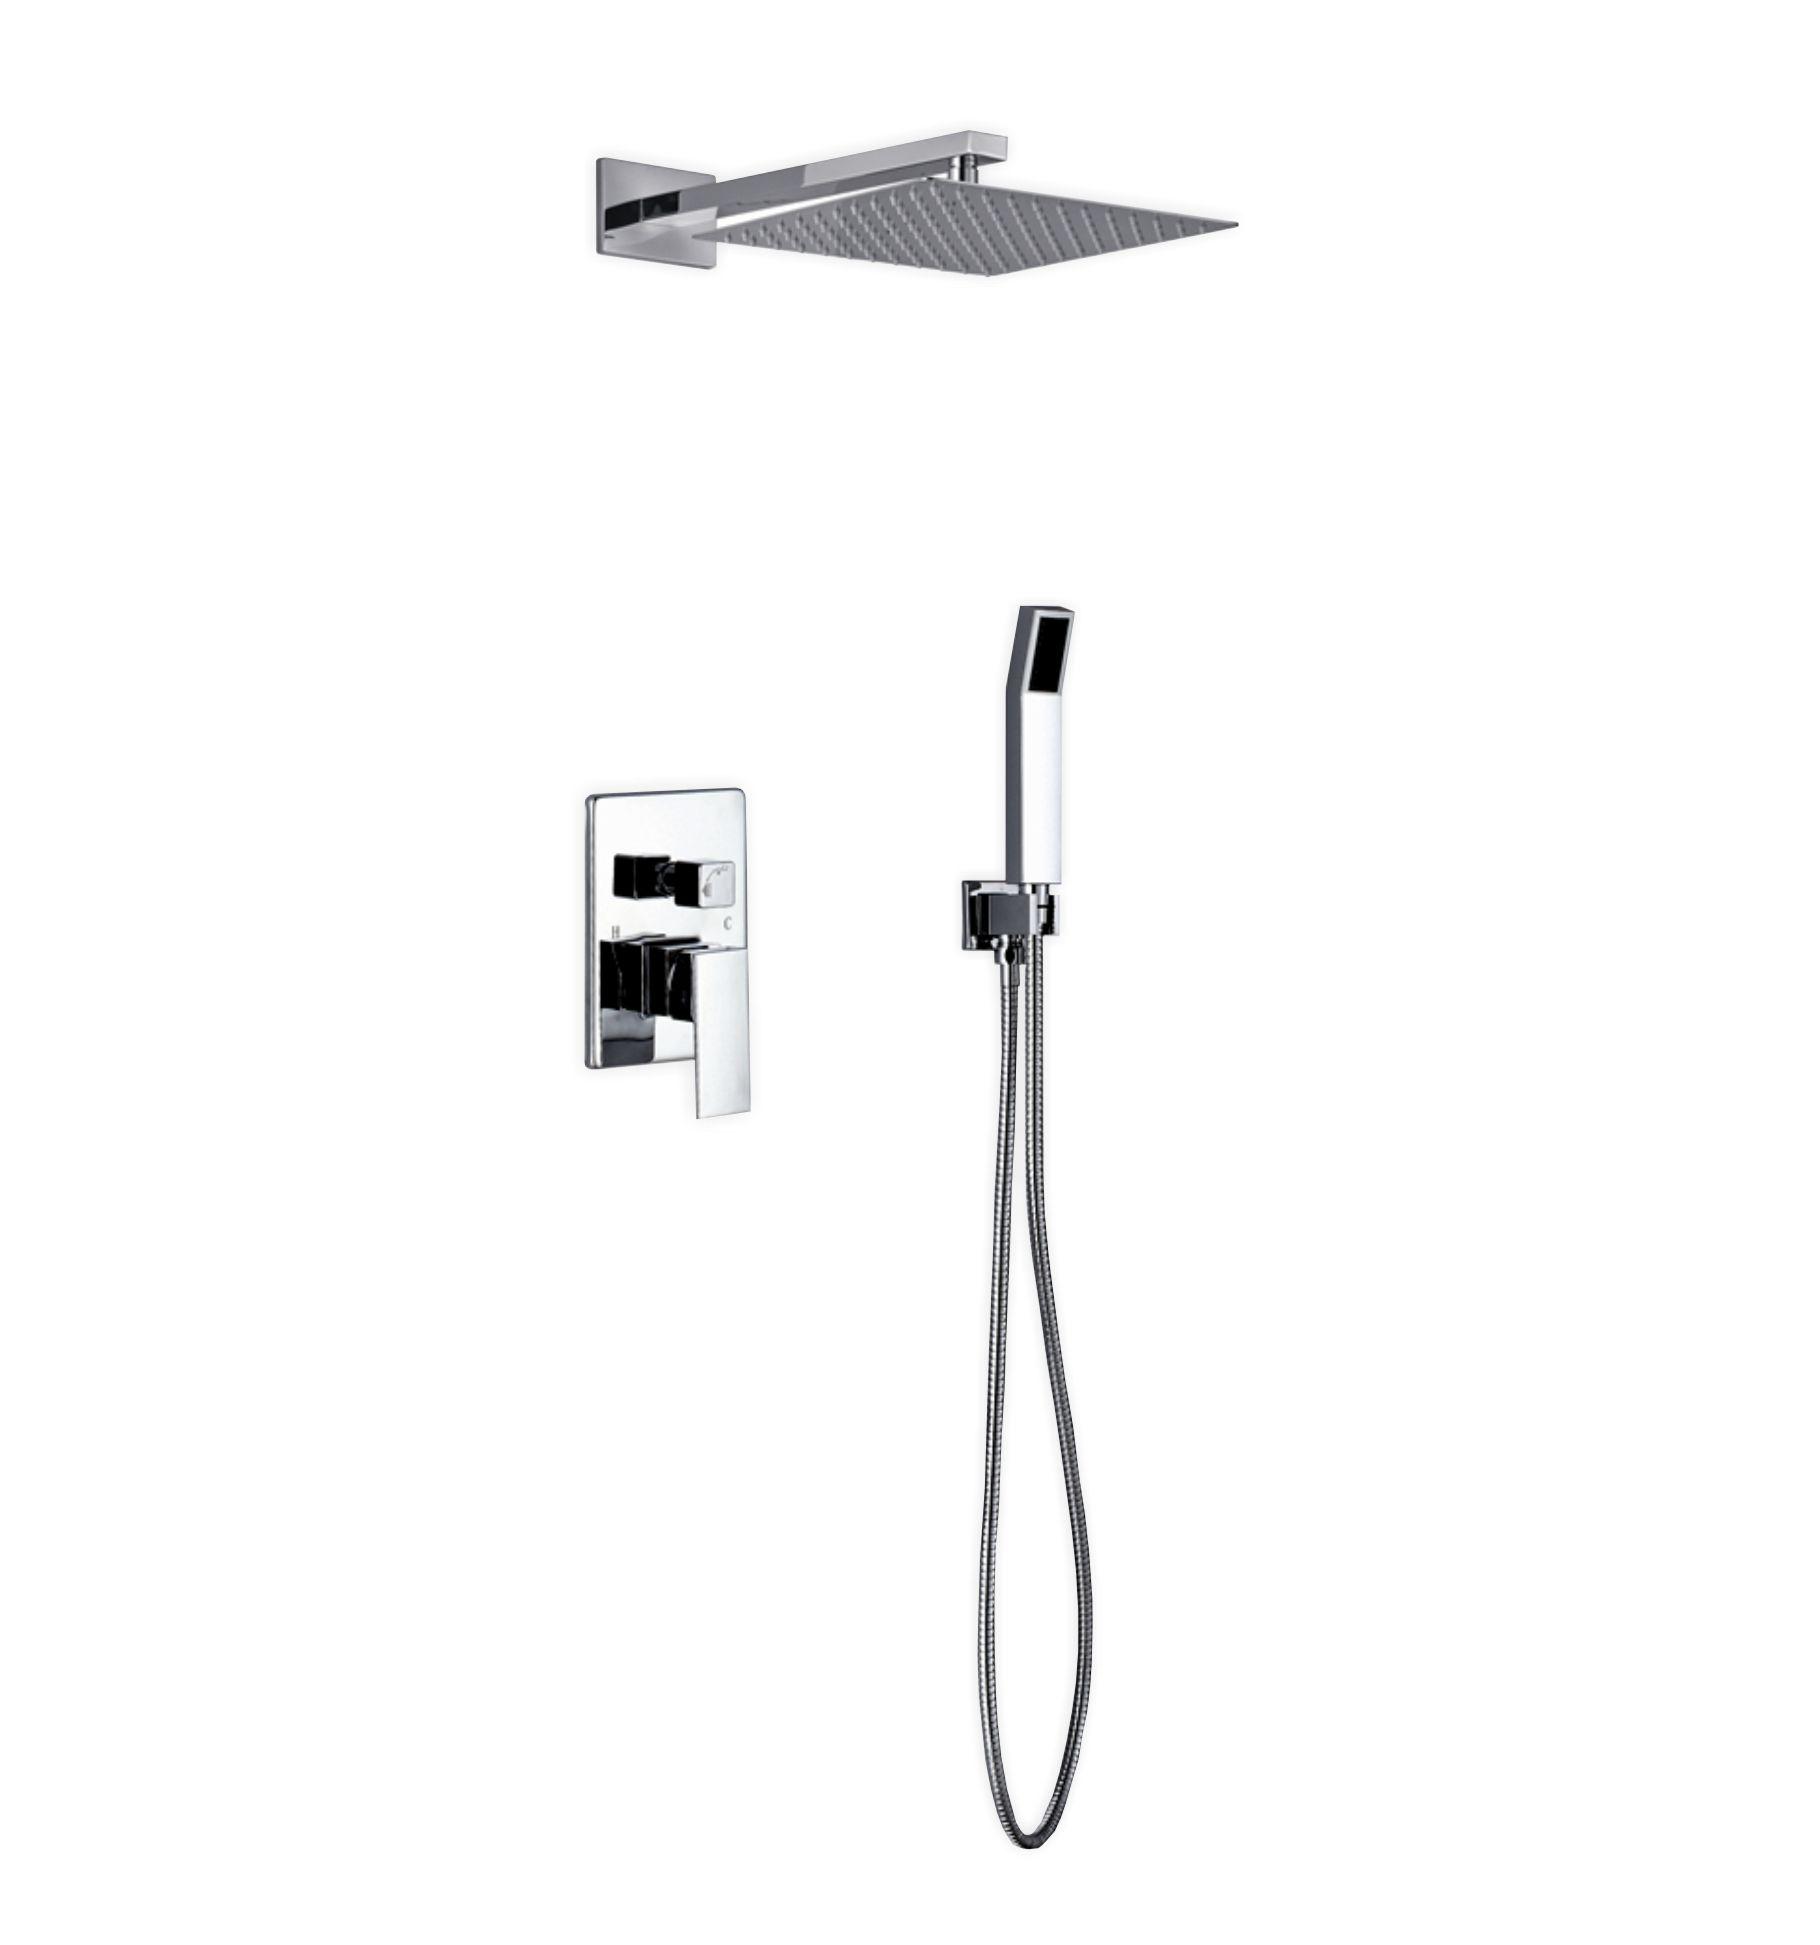 Aqua Piazza Shower Set W 12 Square Rain Shower And Handheld